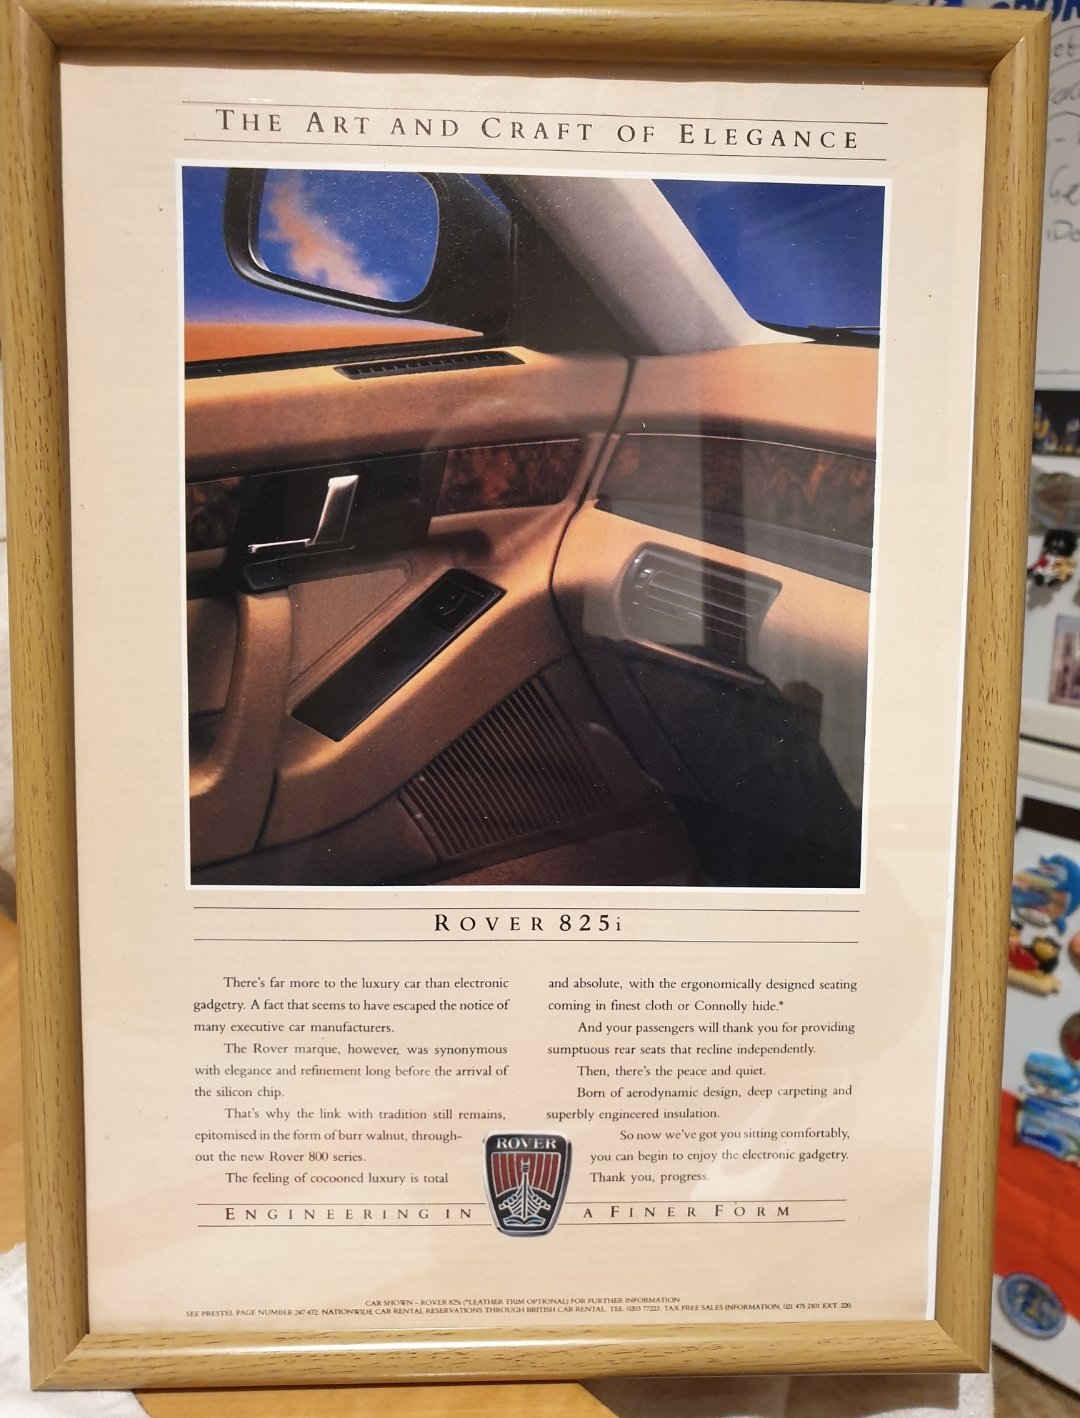 1986 Original Rover 825i Framed Advert For Sale (picture 1 of 2)